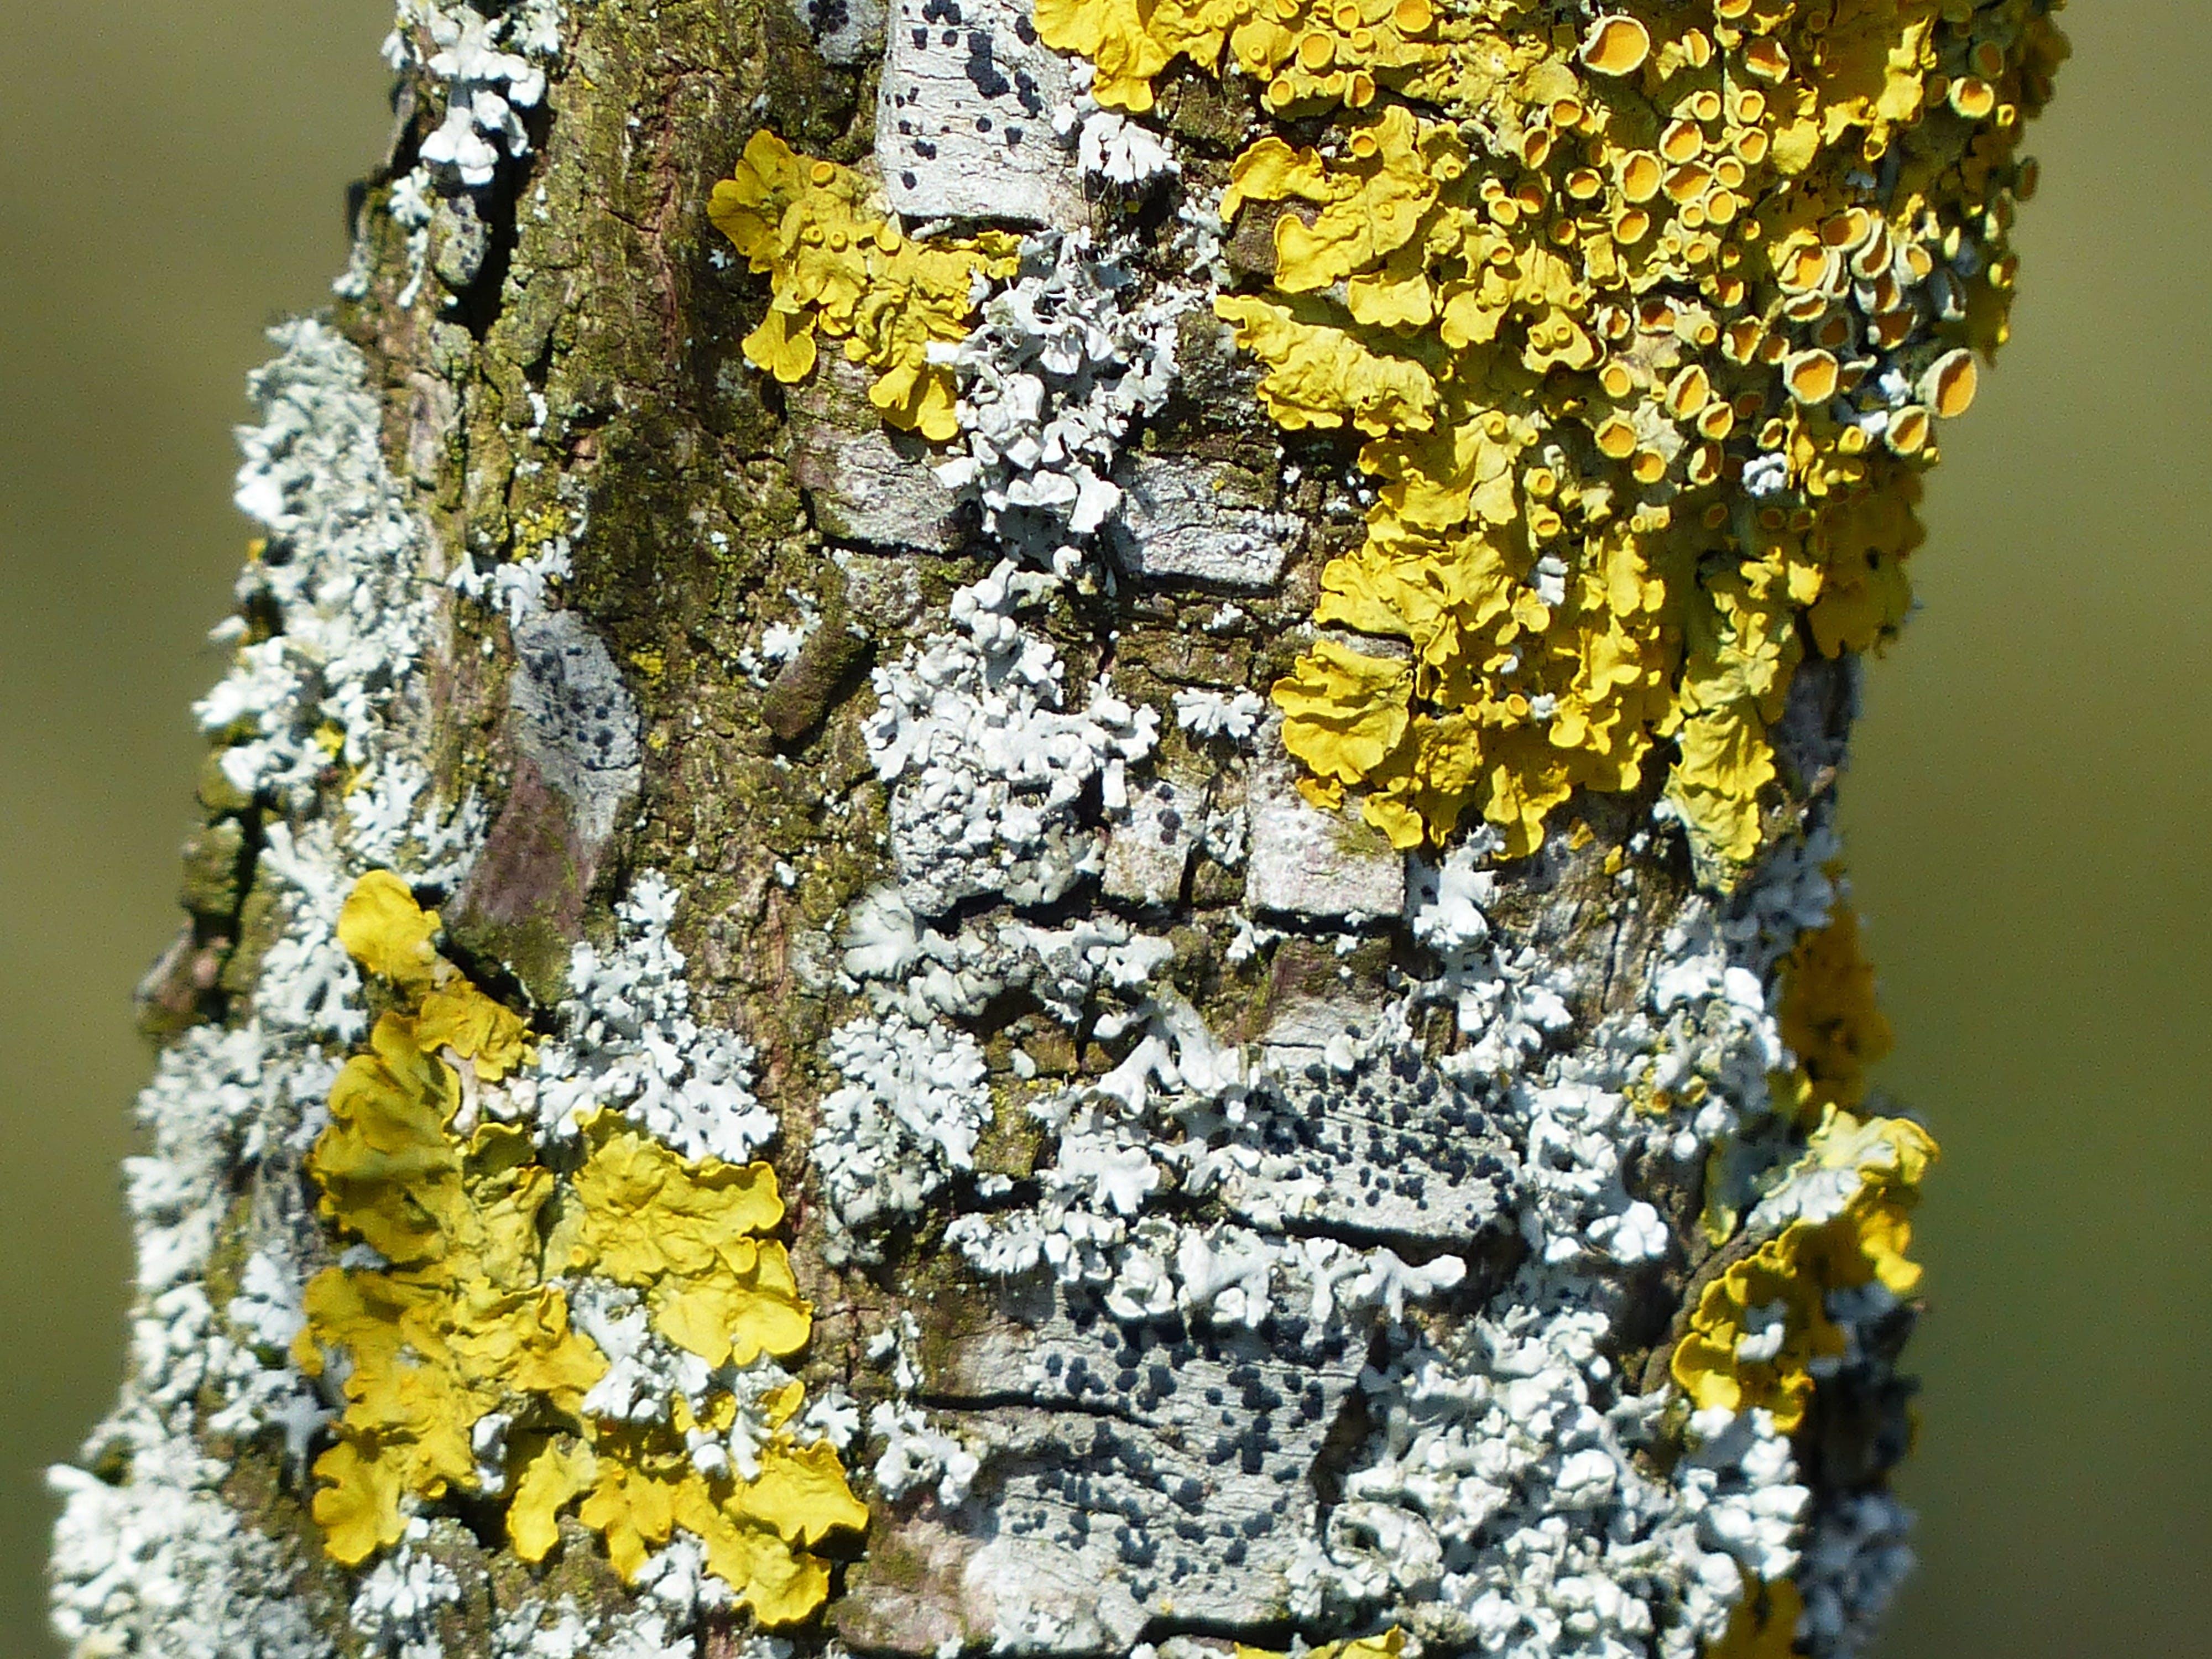 Free stock photo of road, yellow, tree, mushroom